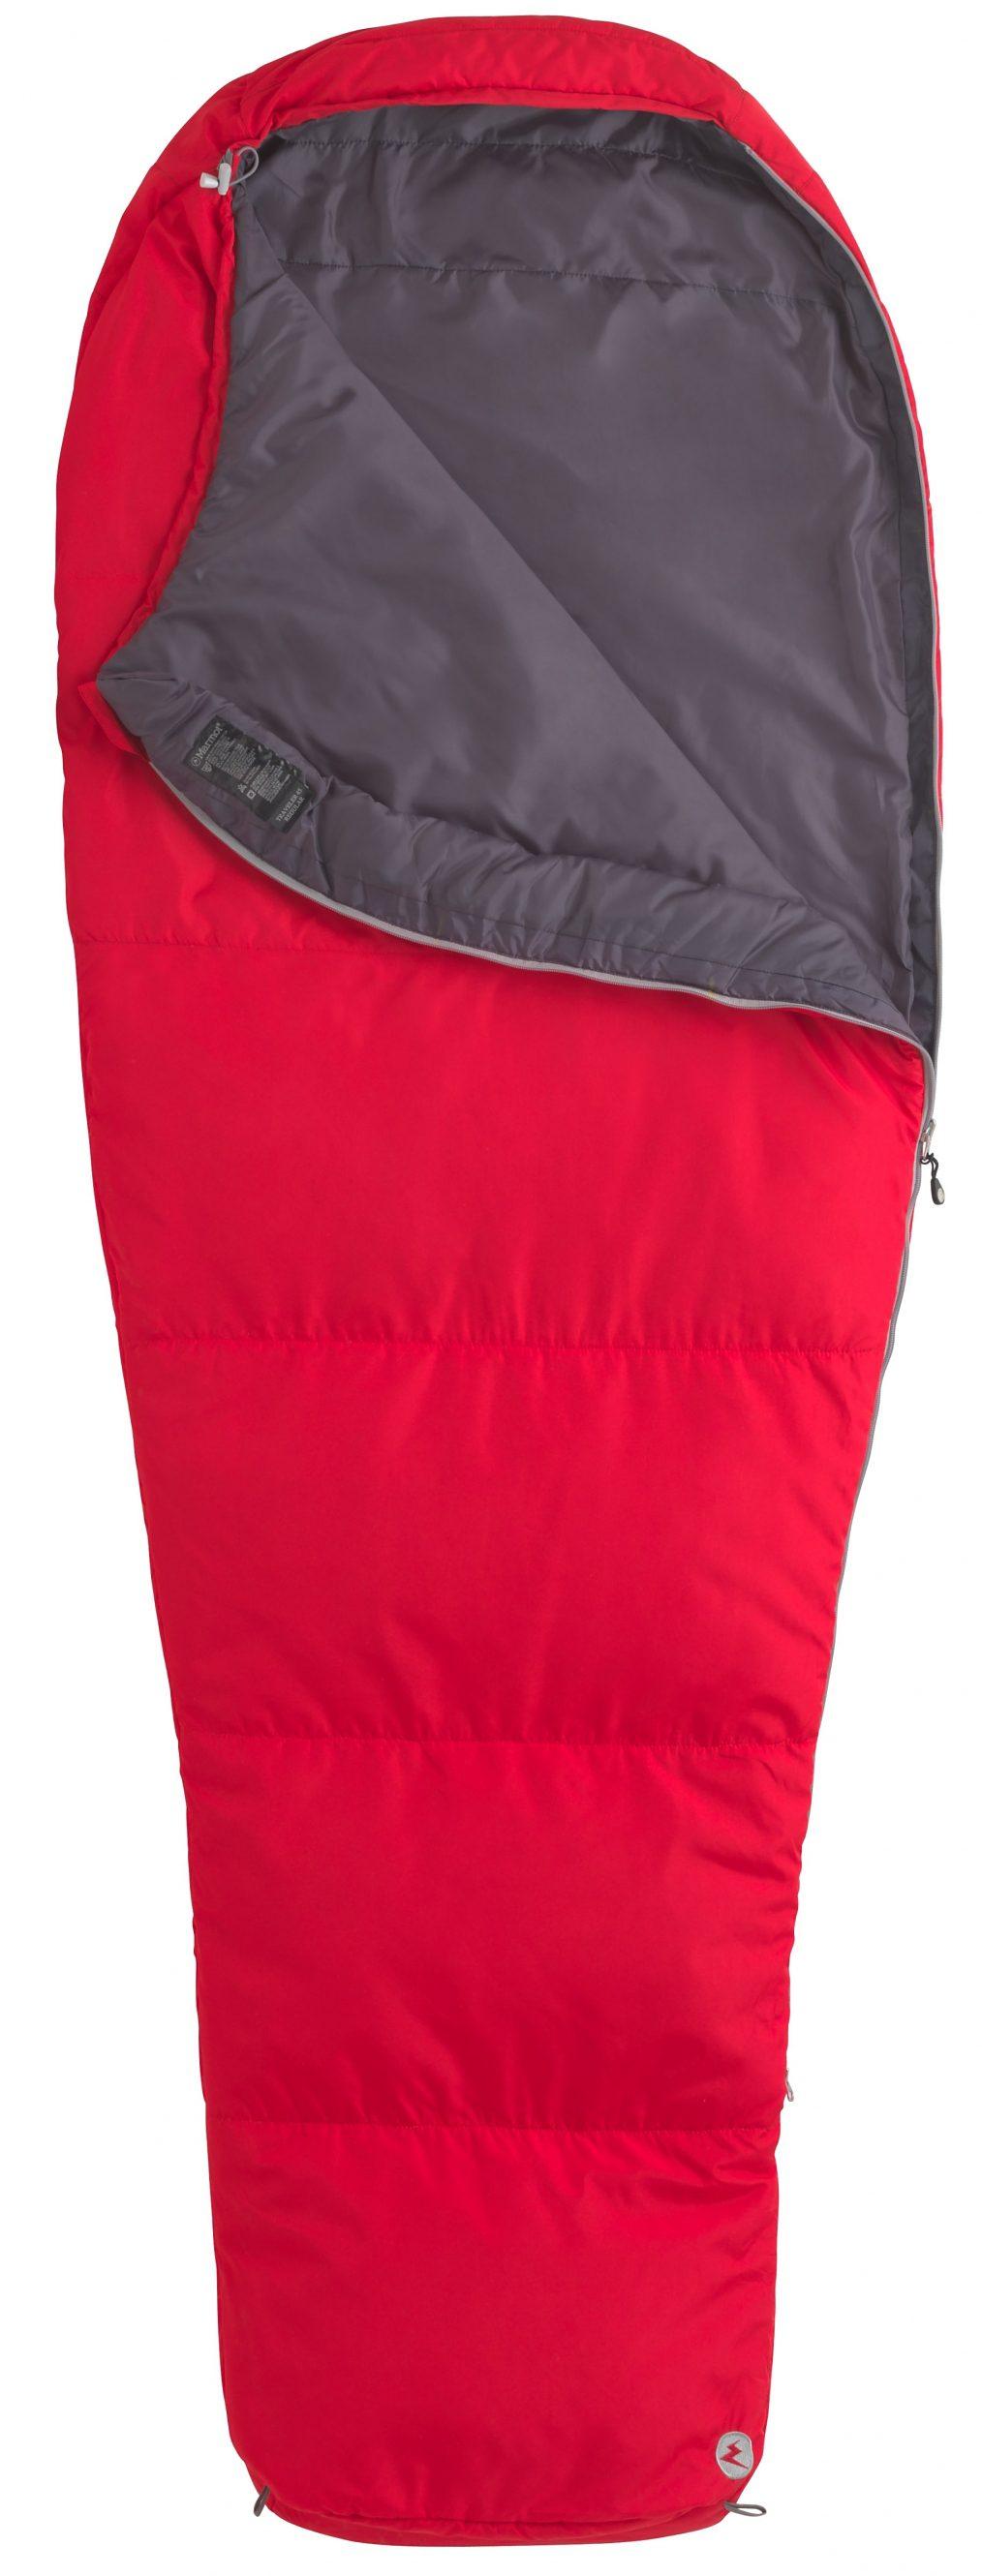 Marmot Schlafsack »NanoWave 45 Sleeping Bag Long«